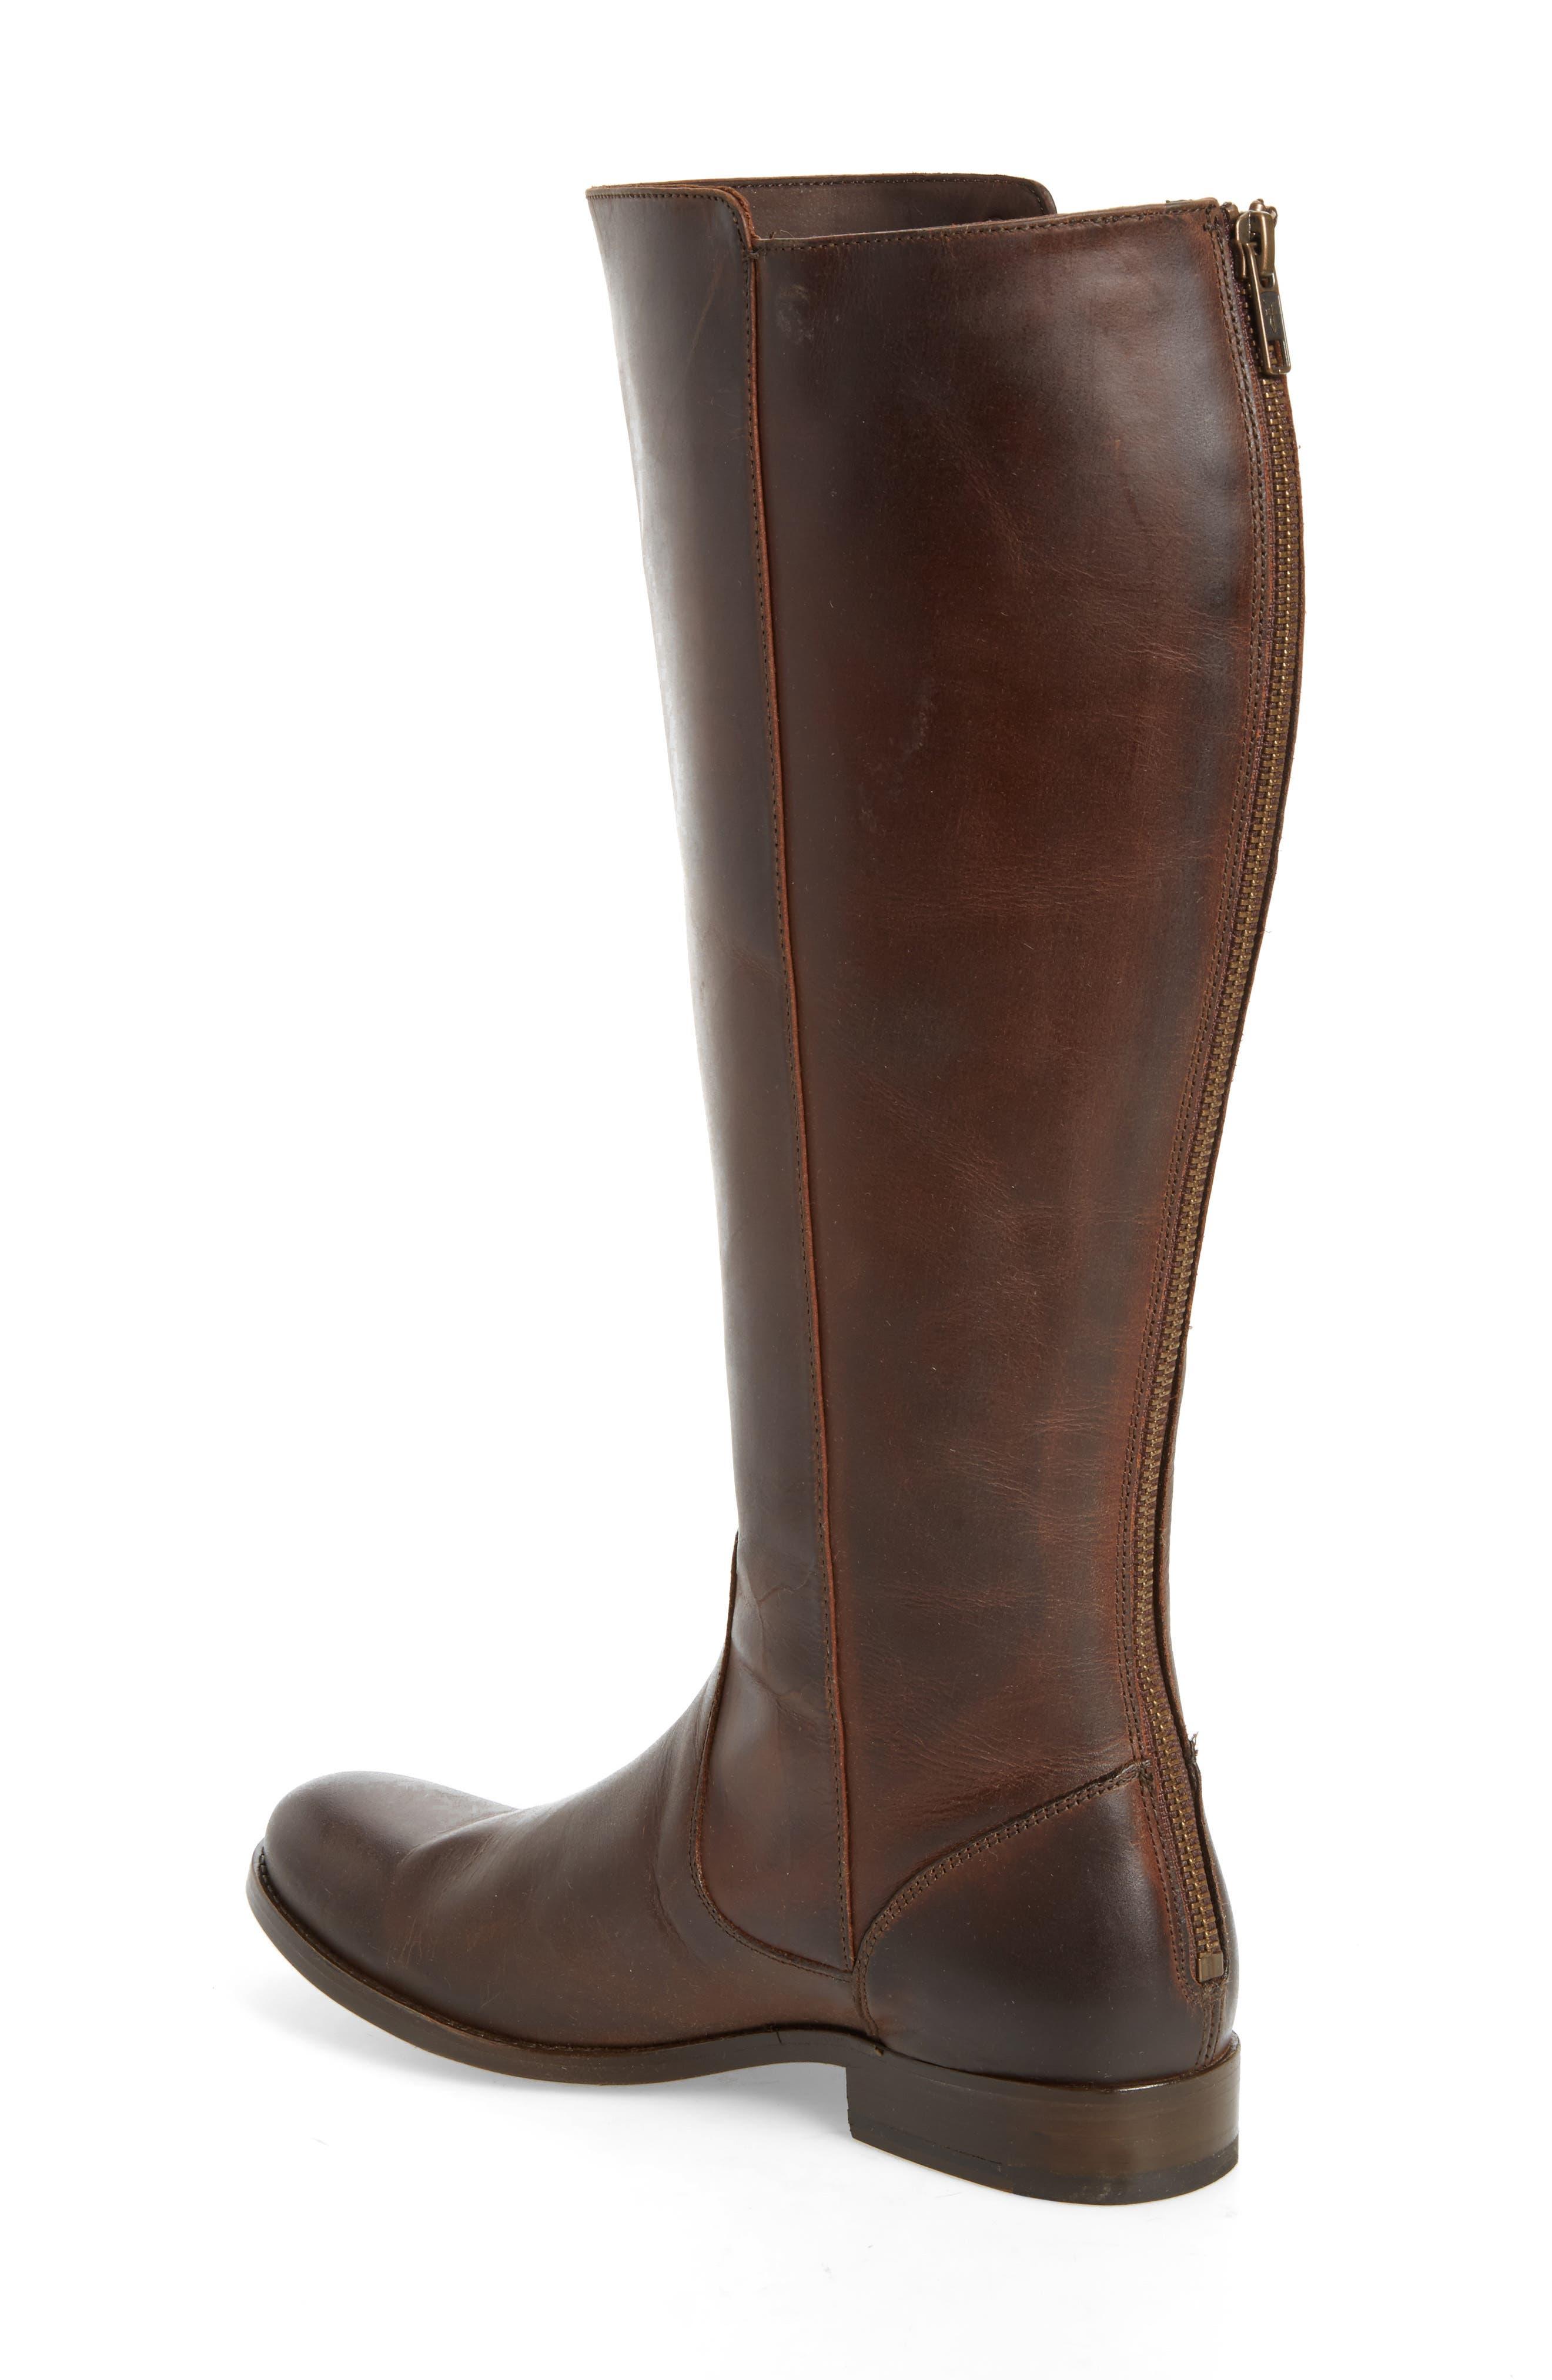 Melissa Stud Knee High Boot,                             Alternate thumbnail 2, color,                             Chocolate Leather